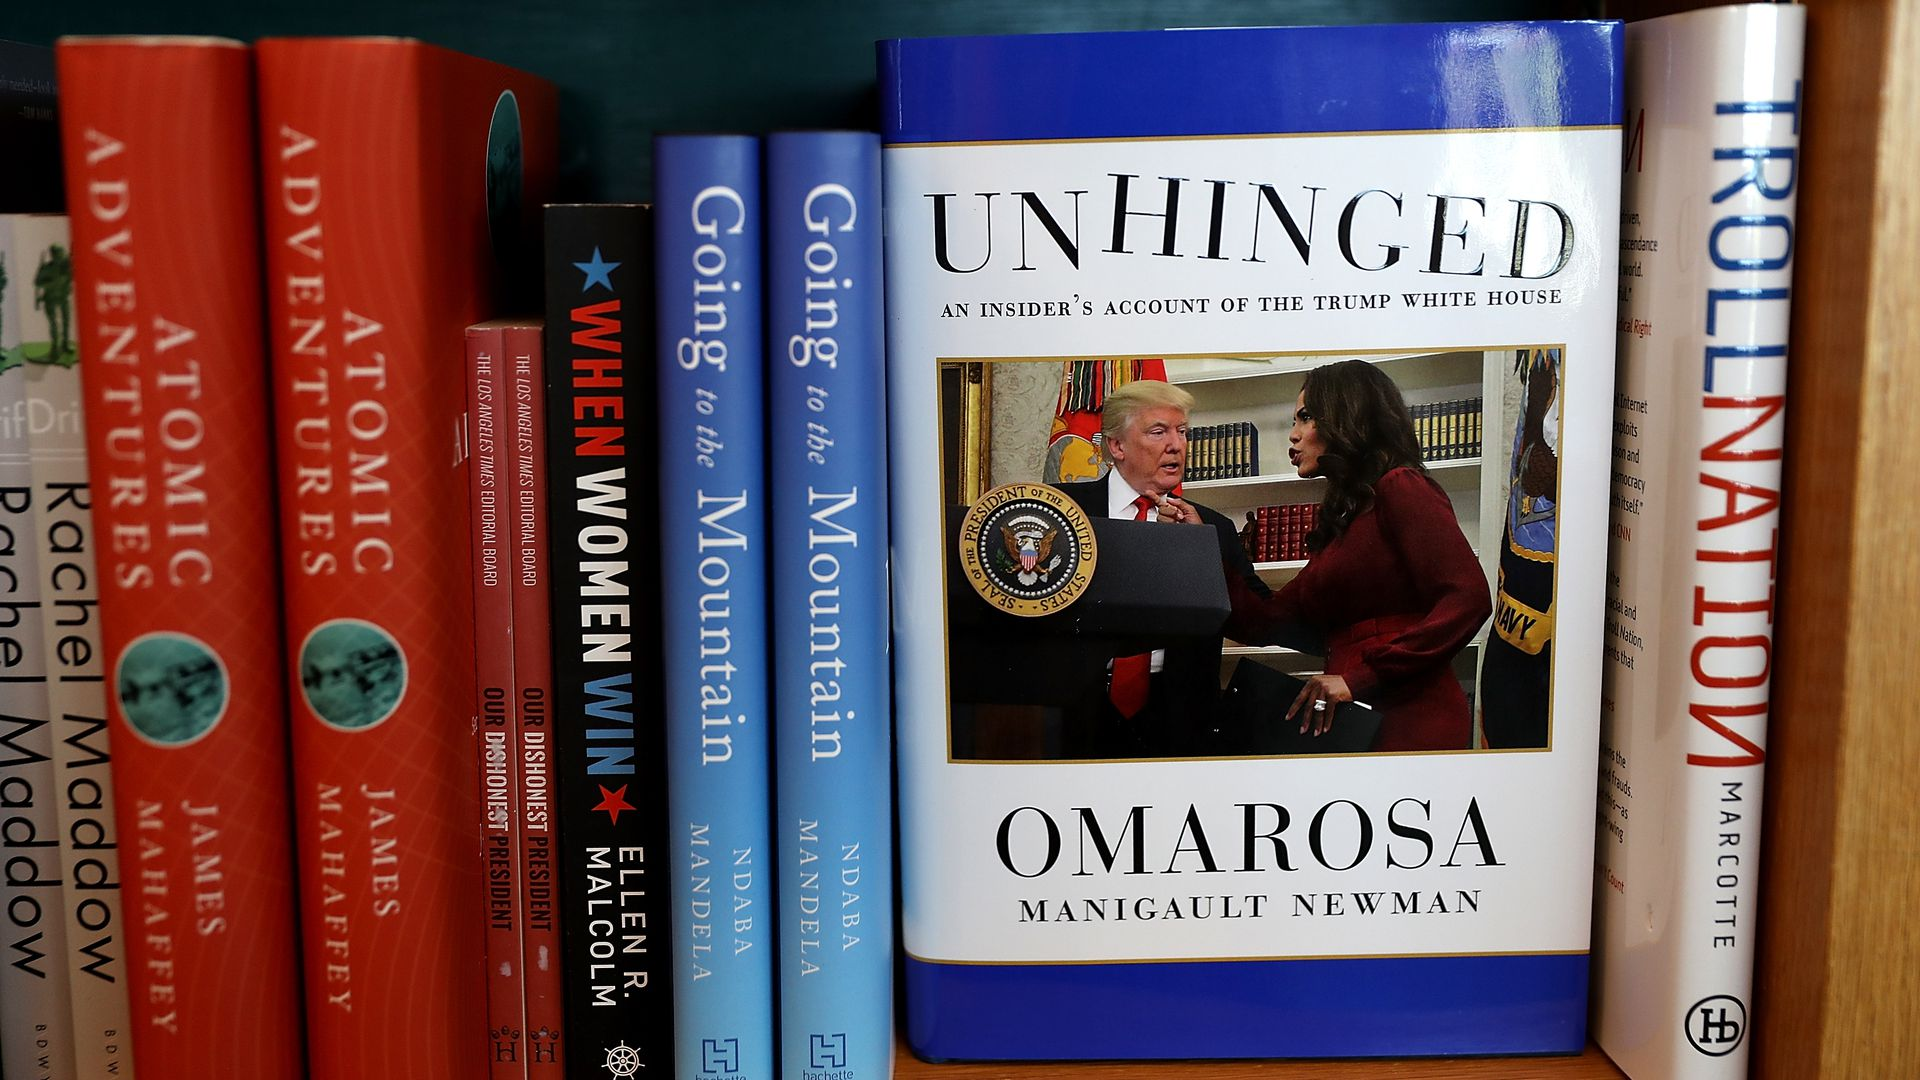 Omarosa's new book on a book shelf.